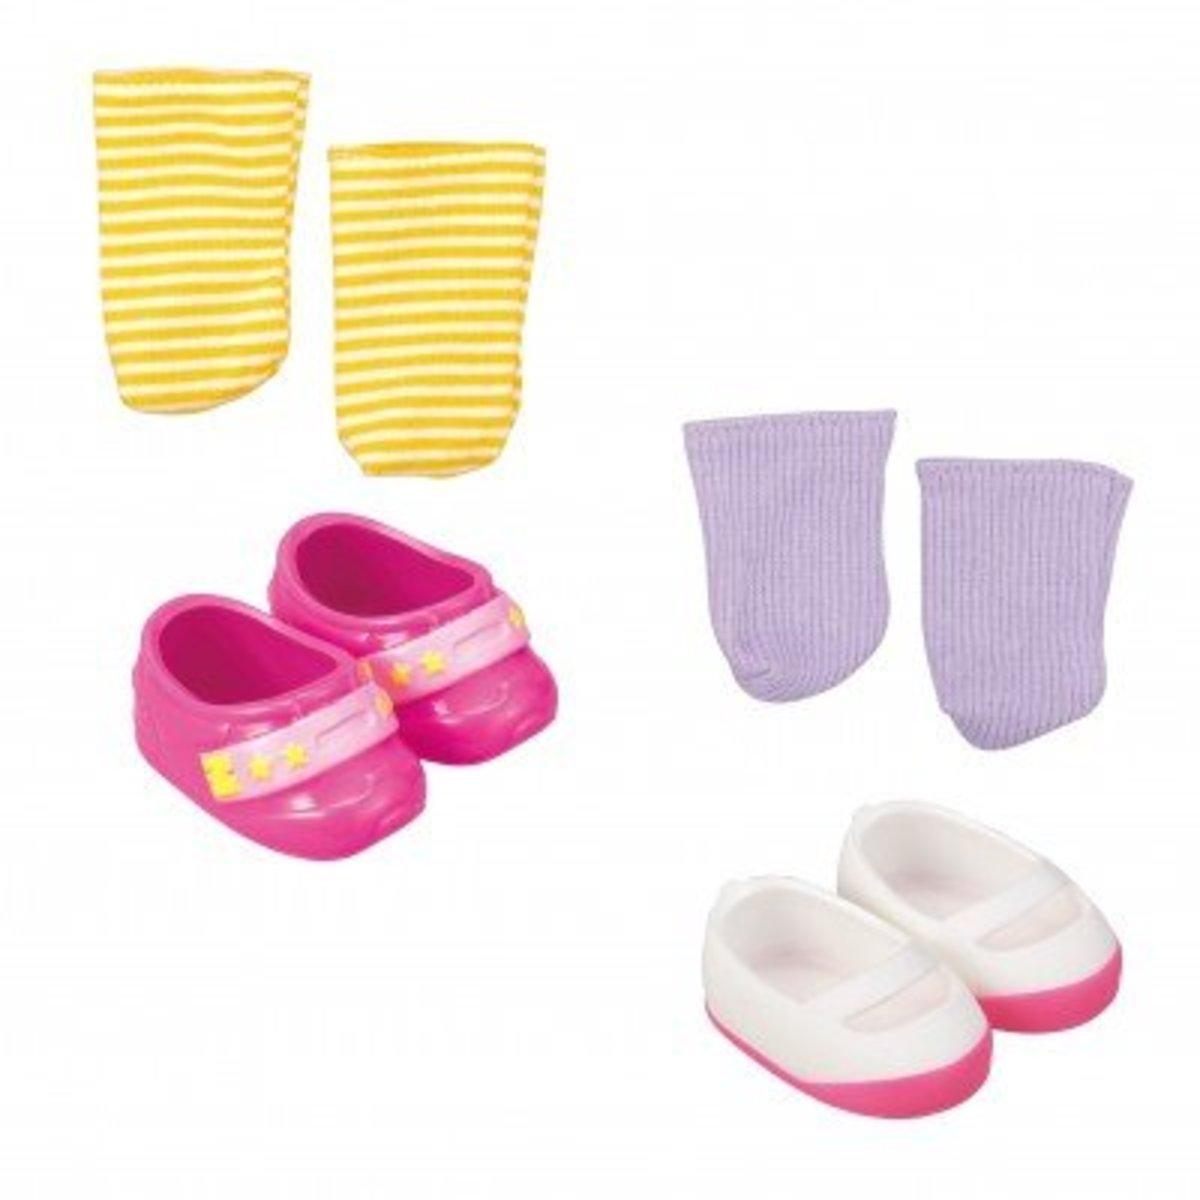 M51478-Preschool Shoes Set